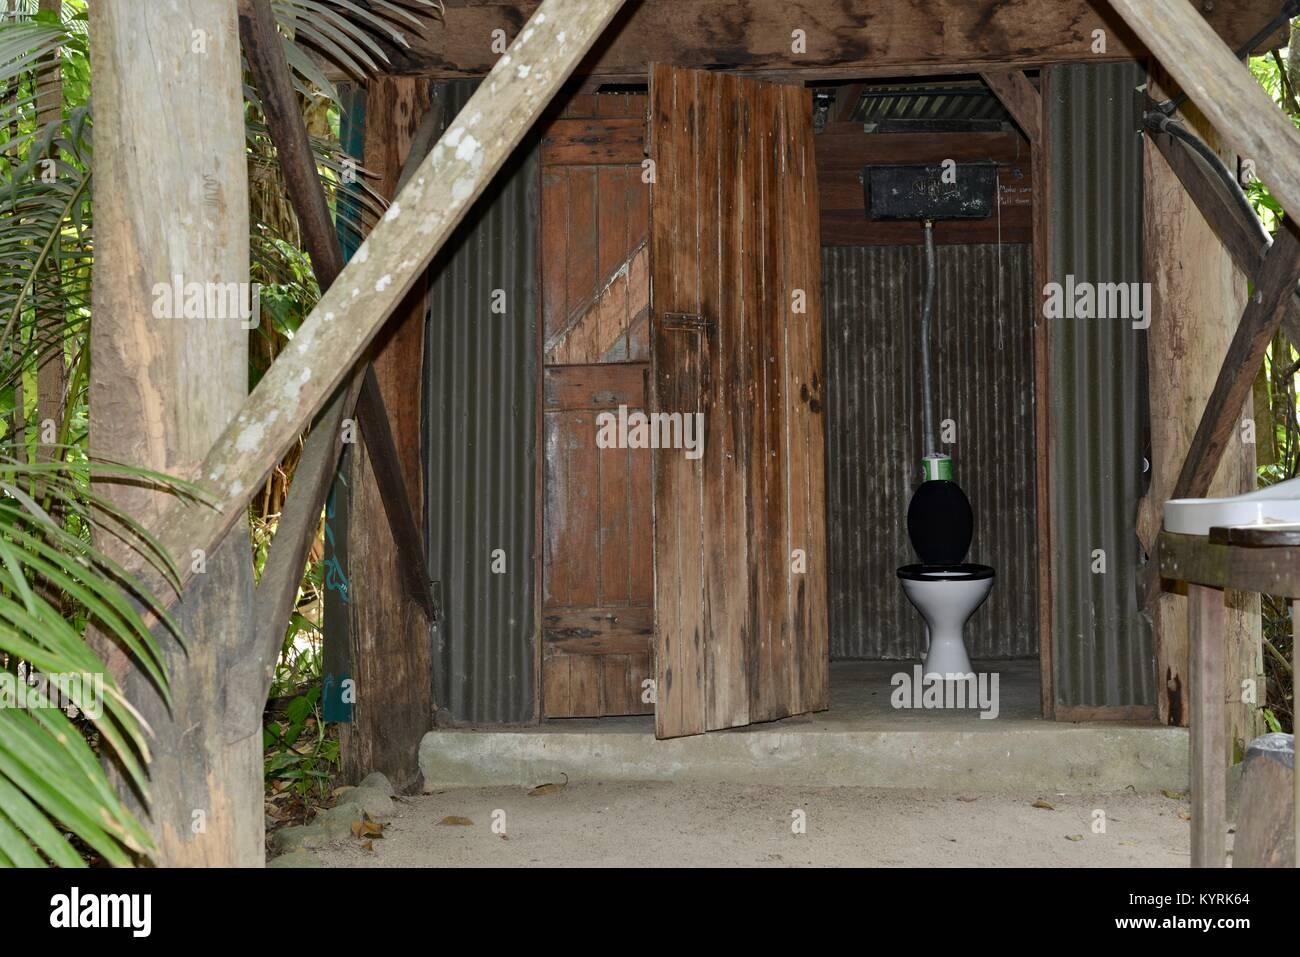 Wc o outback dunny en un edificio de madera de estilo antiguo en un ...